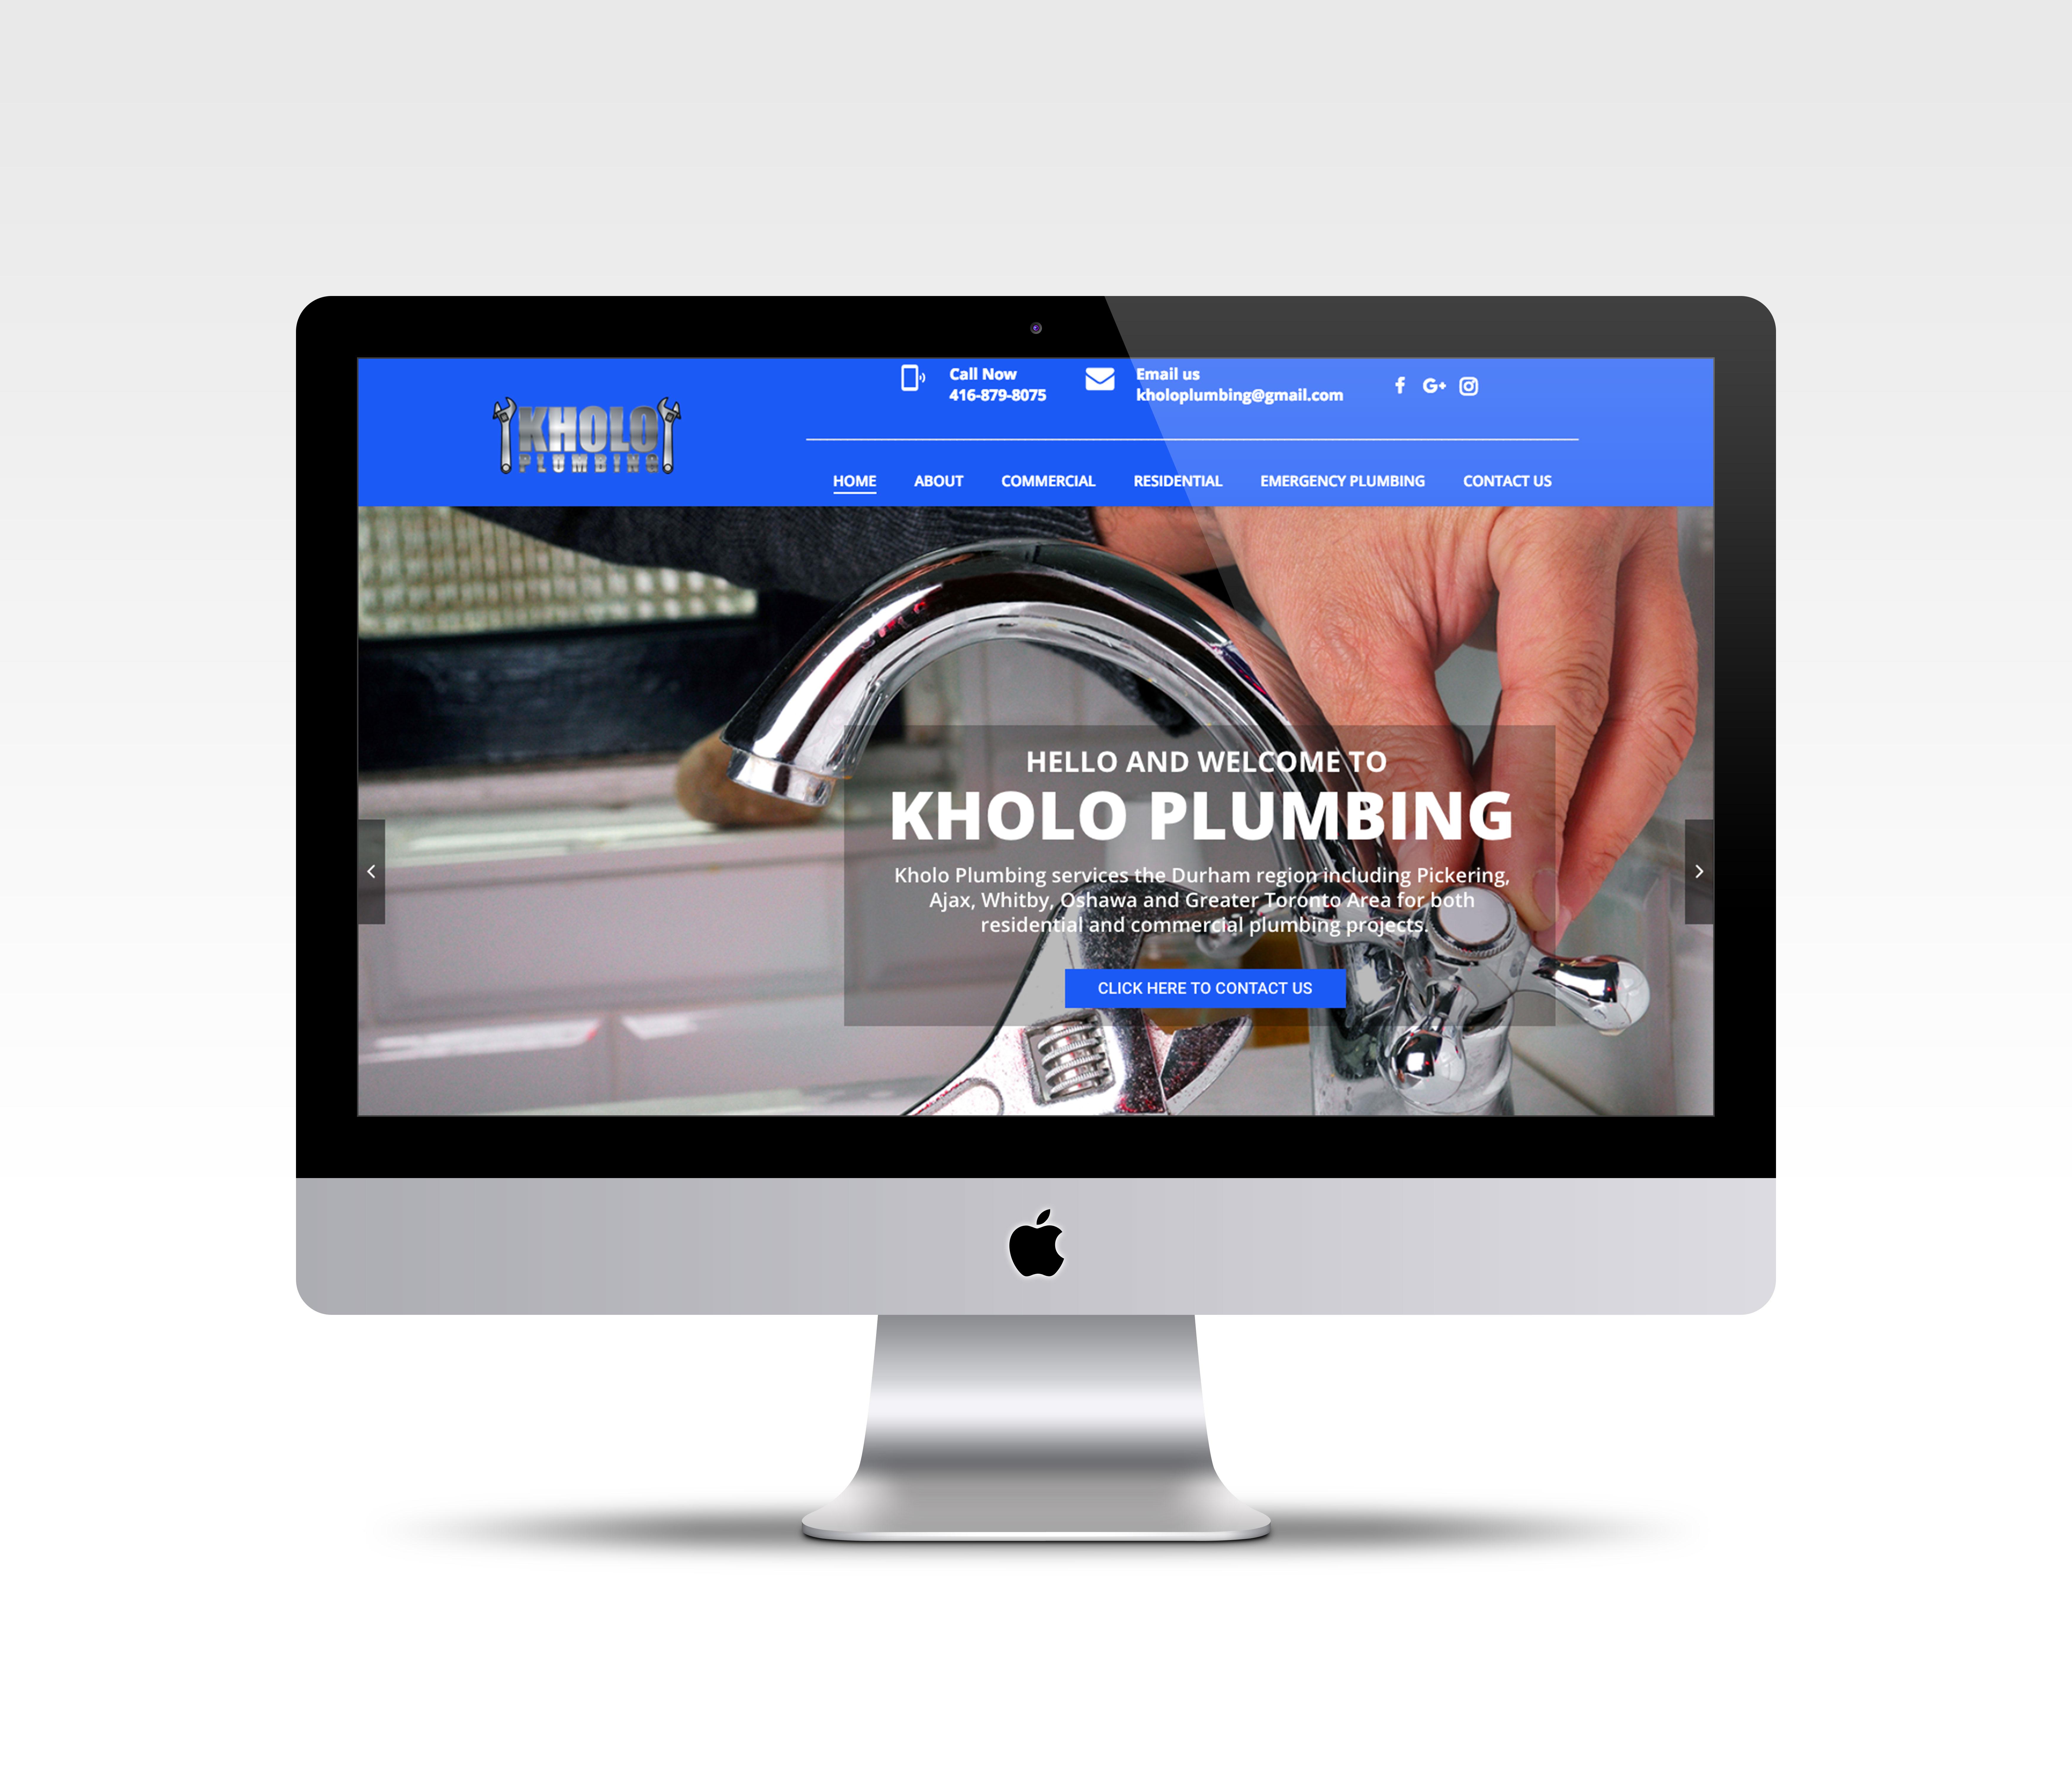 Kholo Plumbing